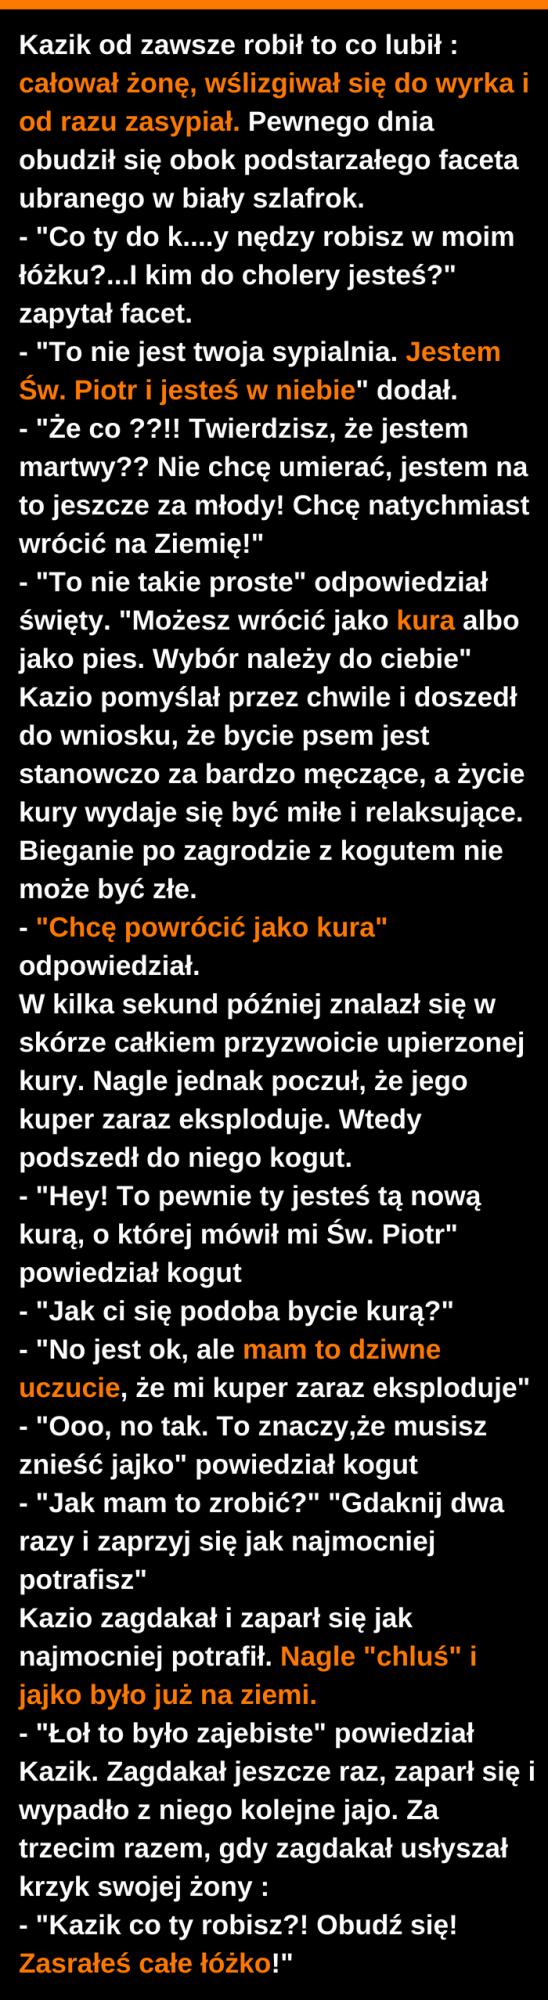 Sen Kazika :D